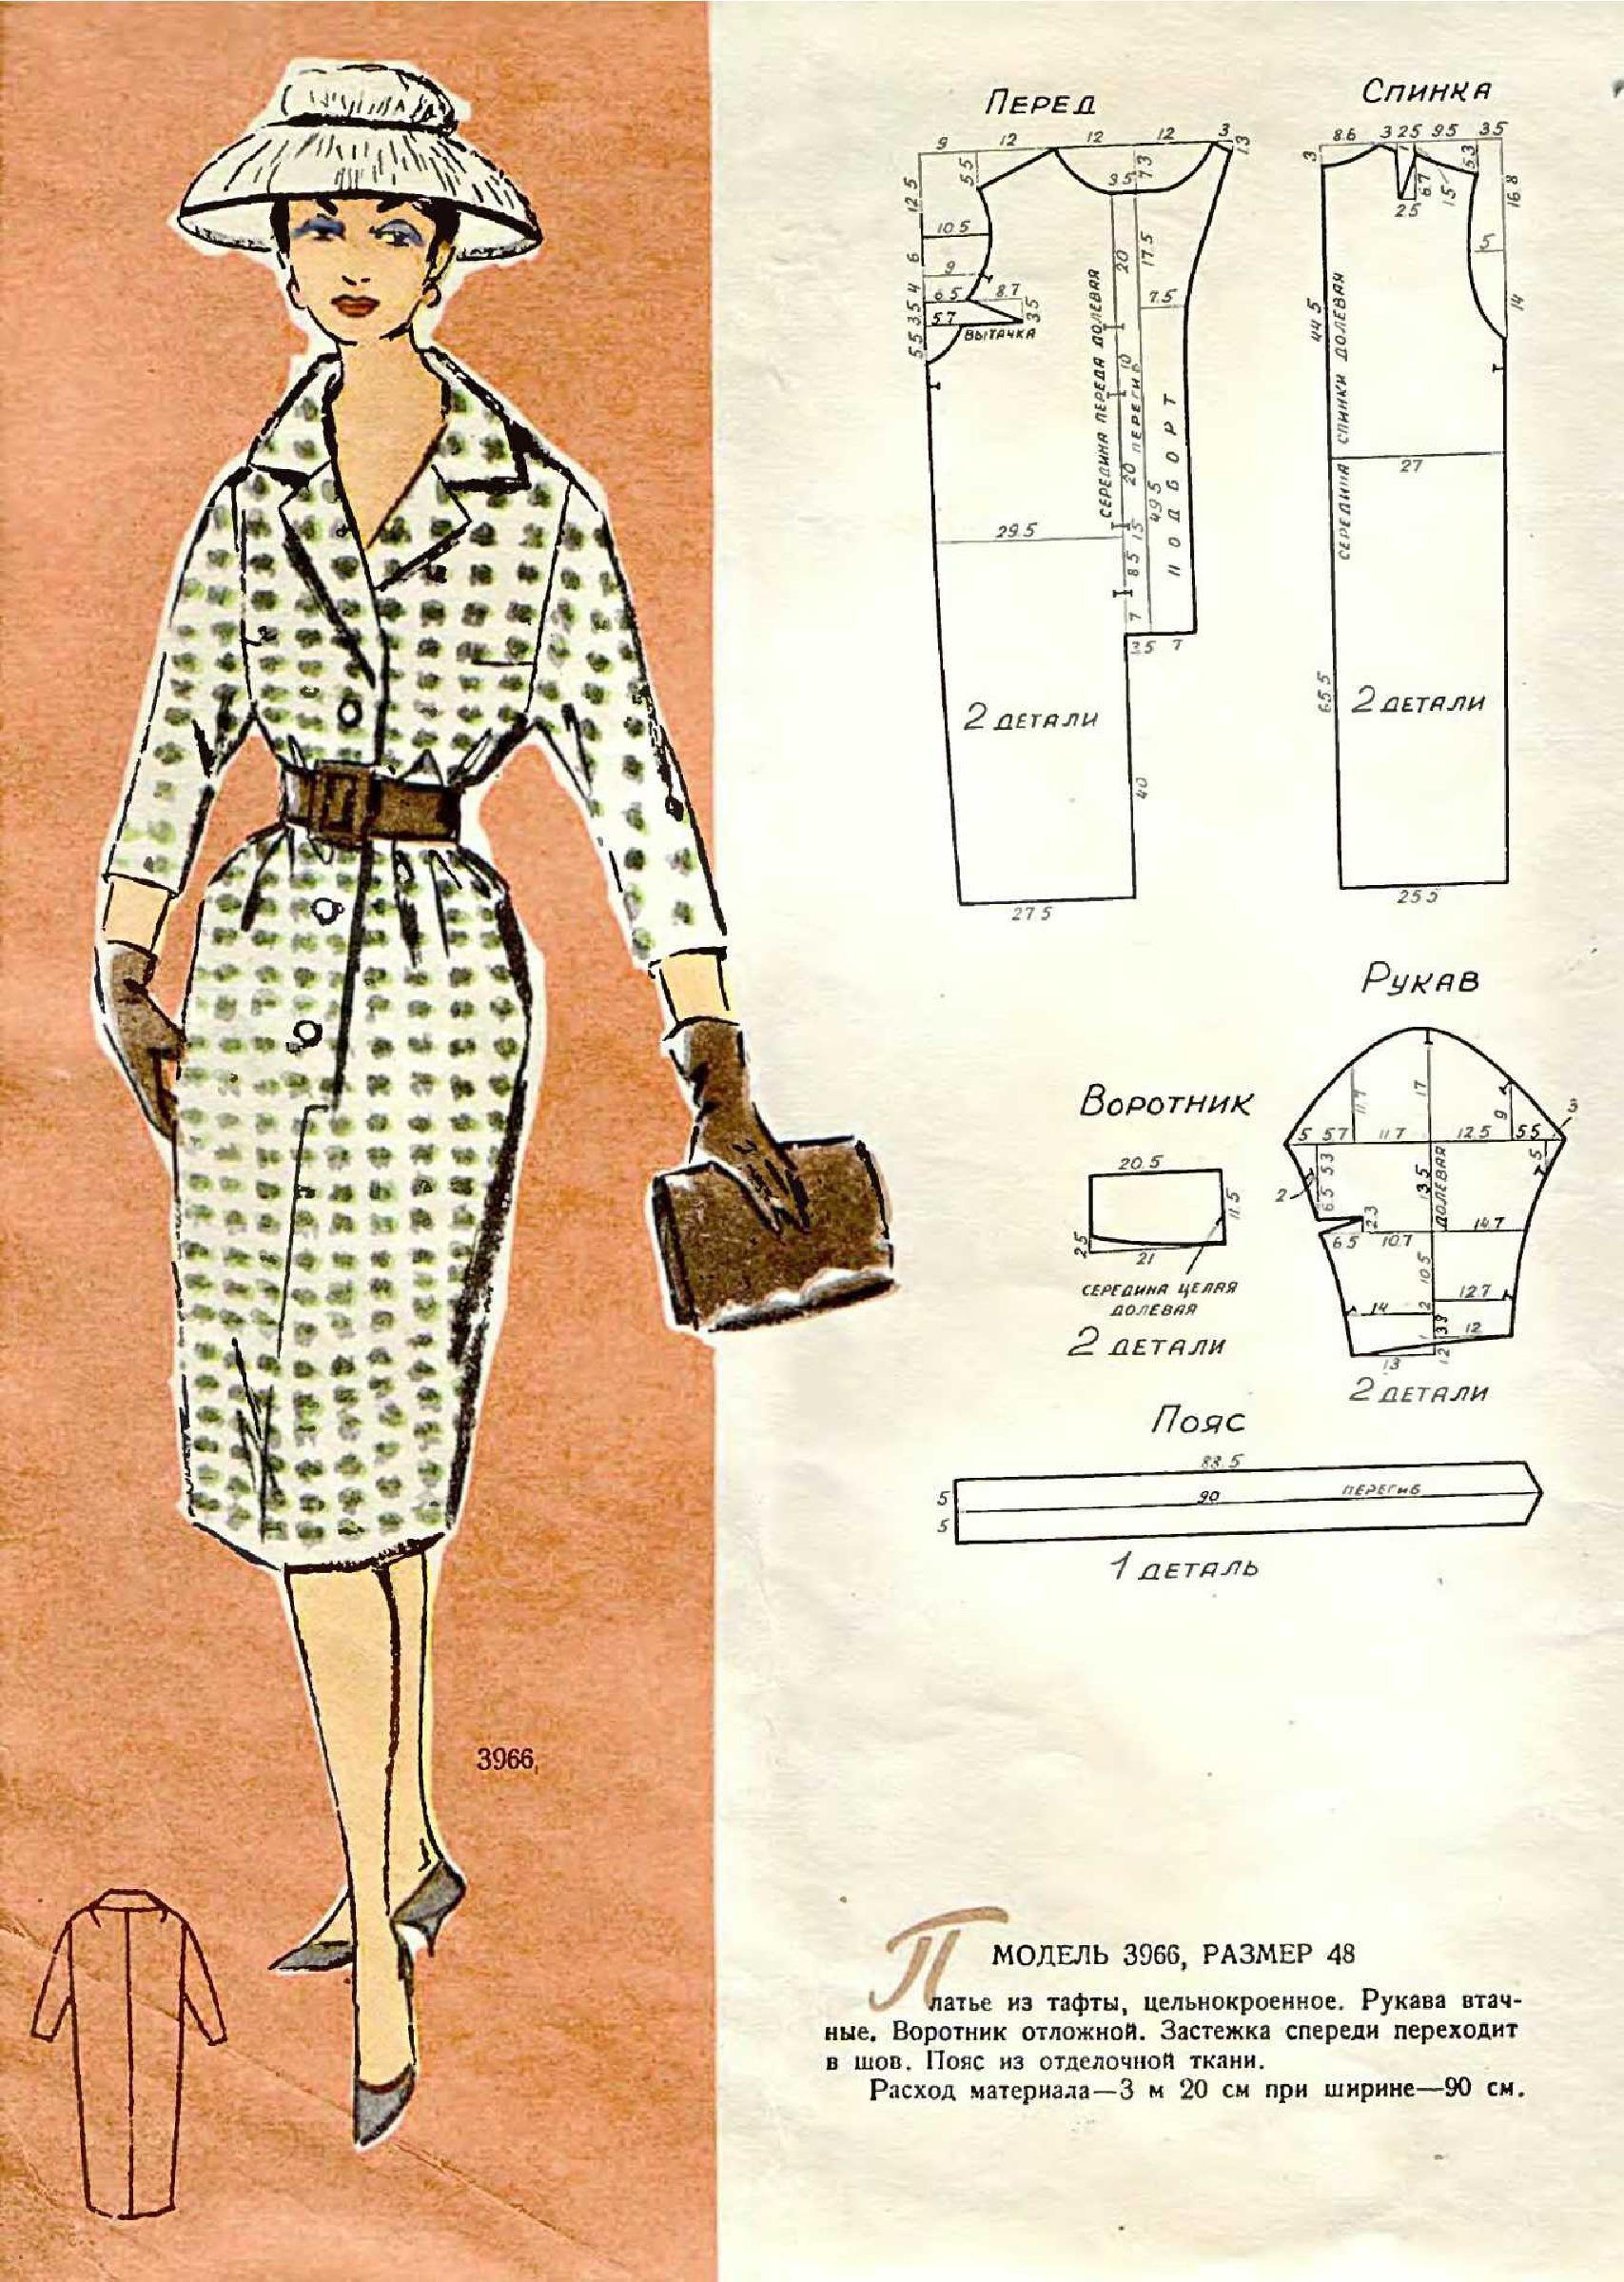 Pin de Stick Chick Yarns en pattern drafting | Pinterest | Patrones ...